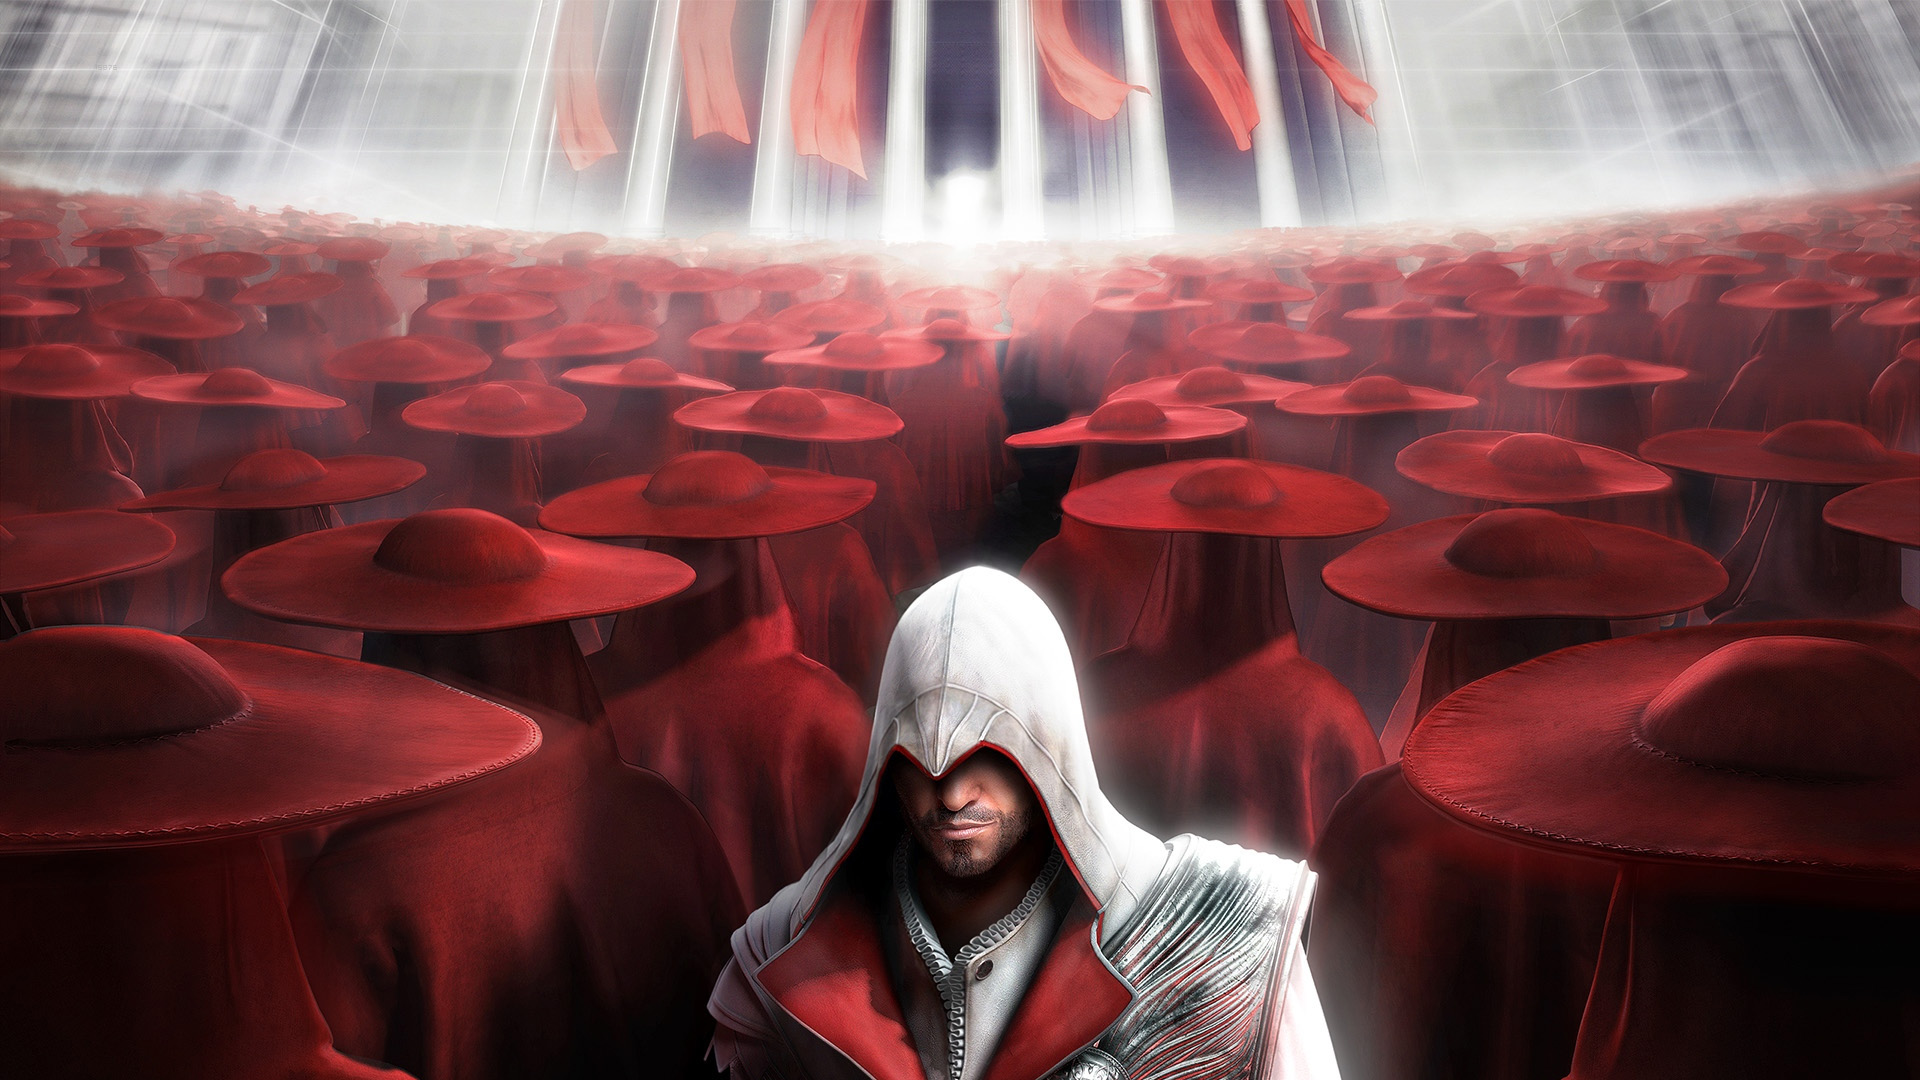 Assassins Creed Brotherhood Wallpaper: Assassin's Creed: Brotherhood HD Wallpaper